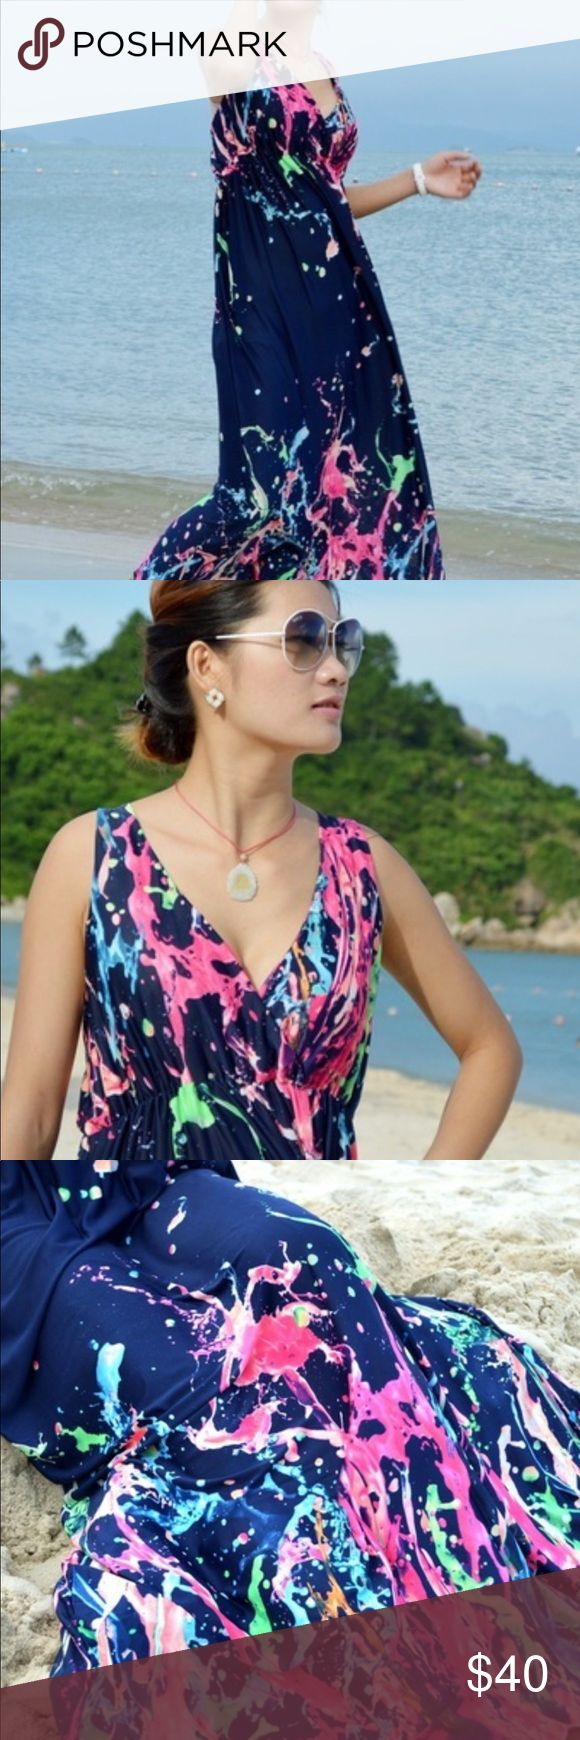 Plus Size Elegant Bohemian Maxi SunDress 18W Brand New Women's Plus Size Elegant Formal Floral Print Bohemian Long  Vogue Evening Party Maxi Dress 1...